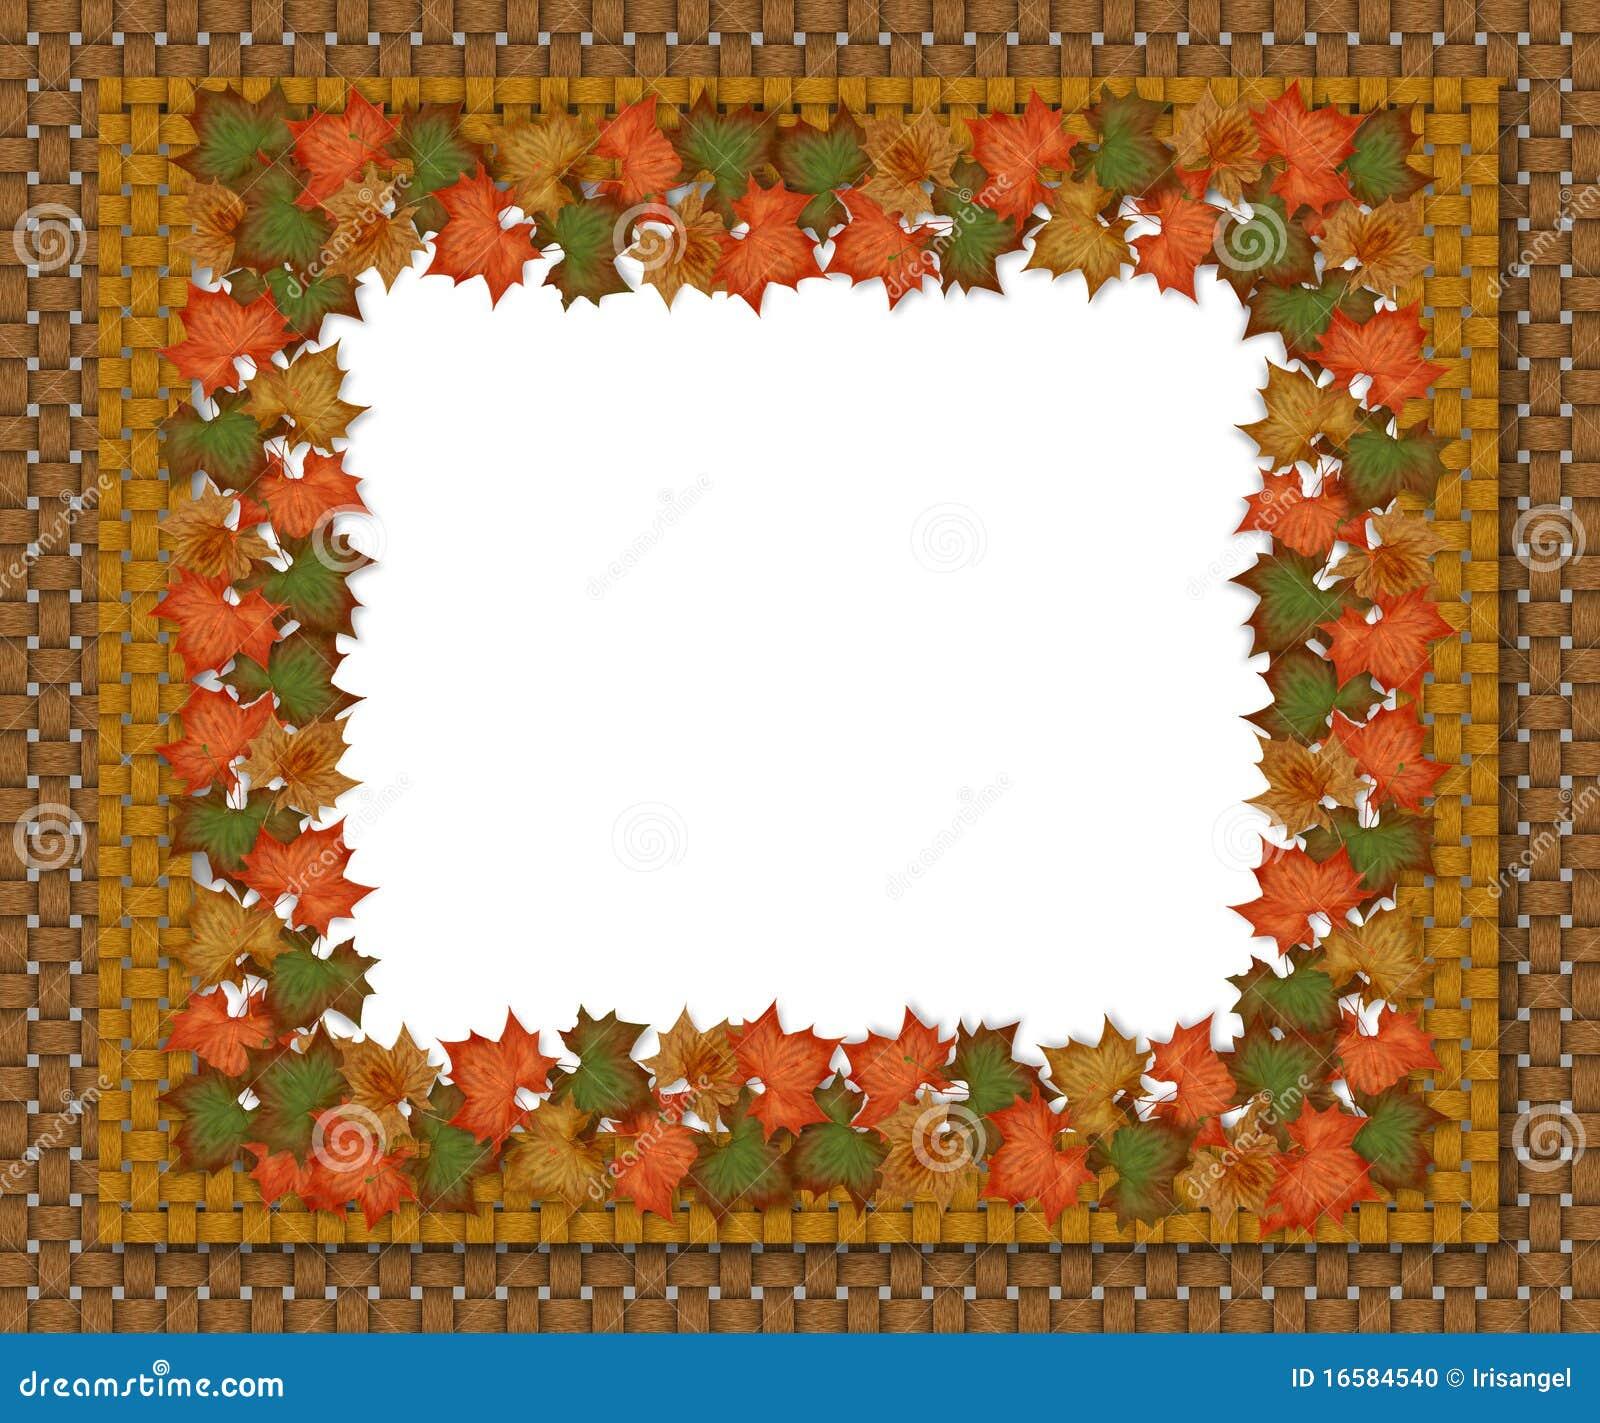 autumn fall leaves border design stock illustration